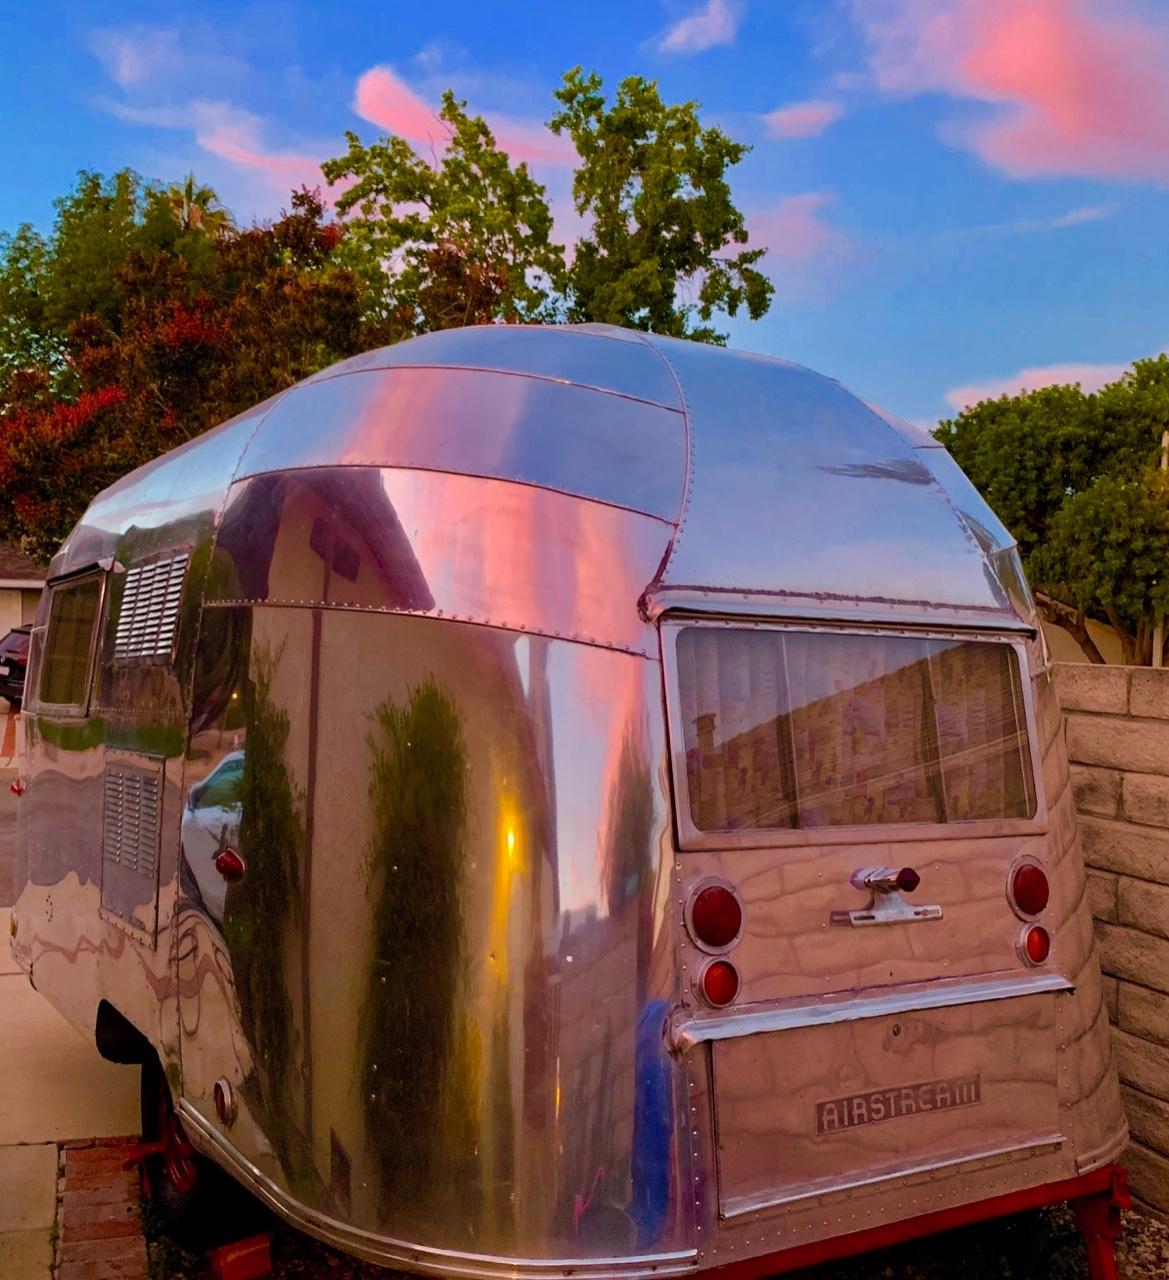 California - Airstream For Sale - Airstream travel trailers